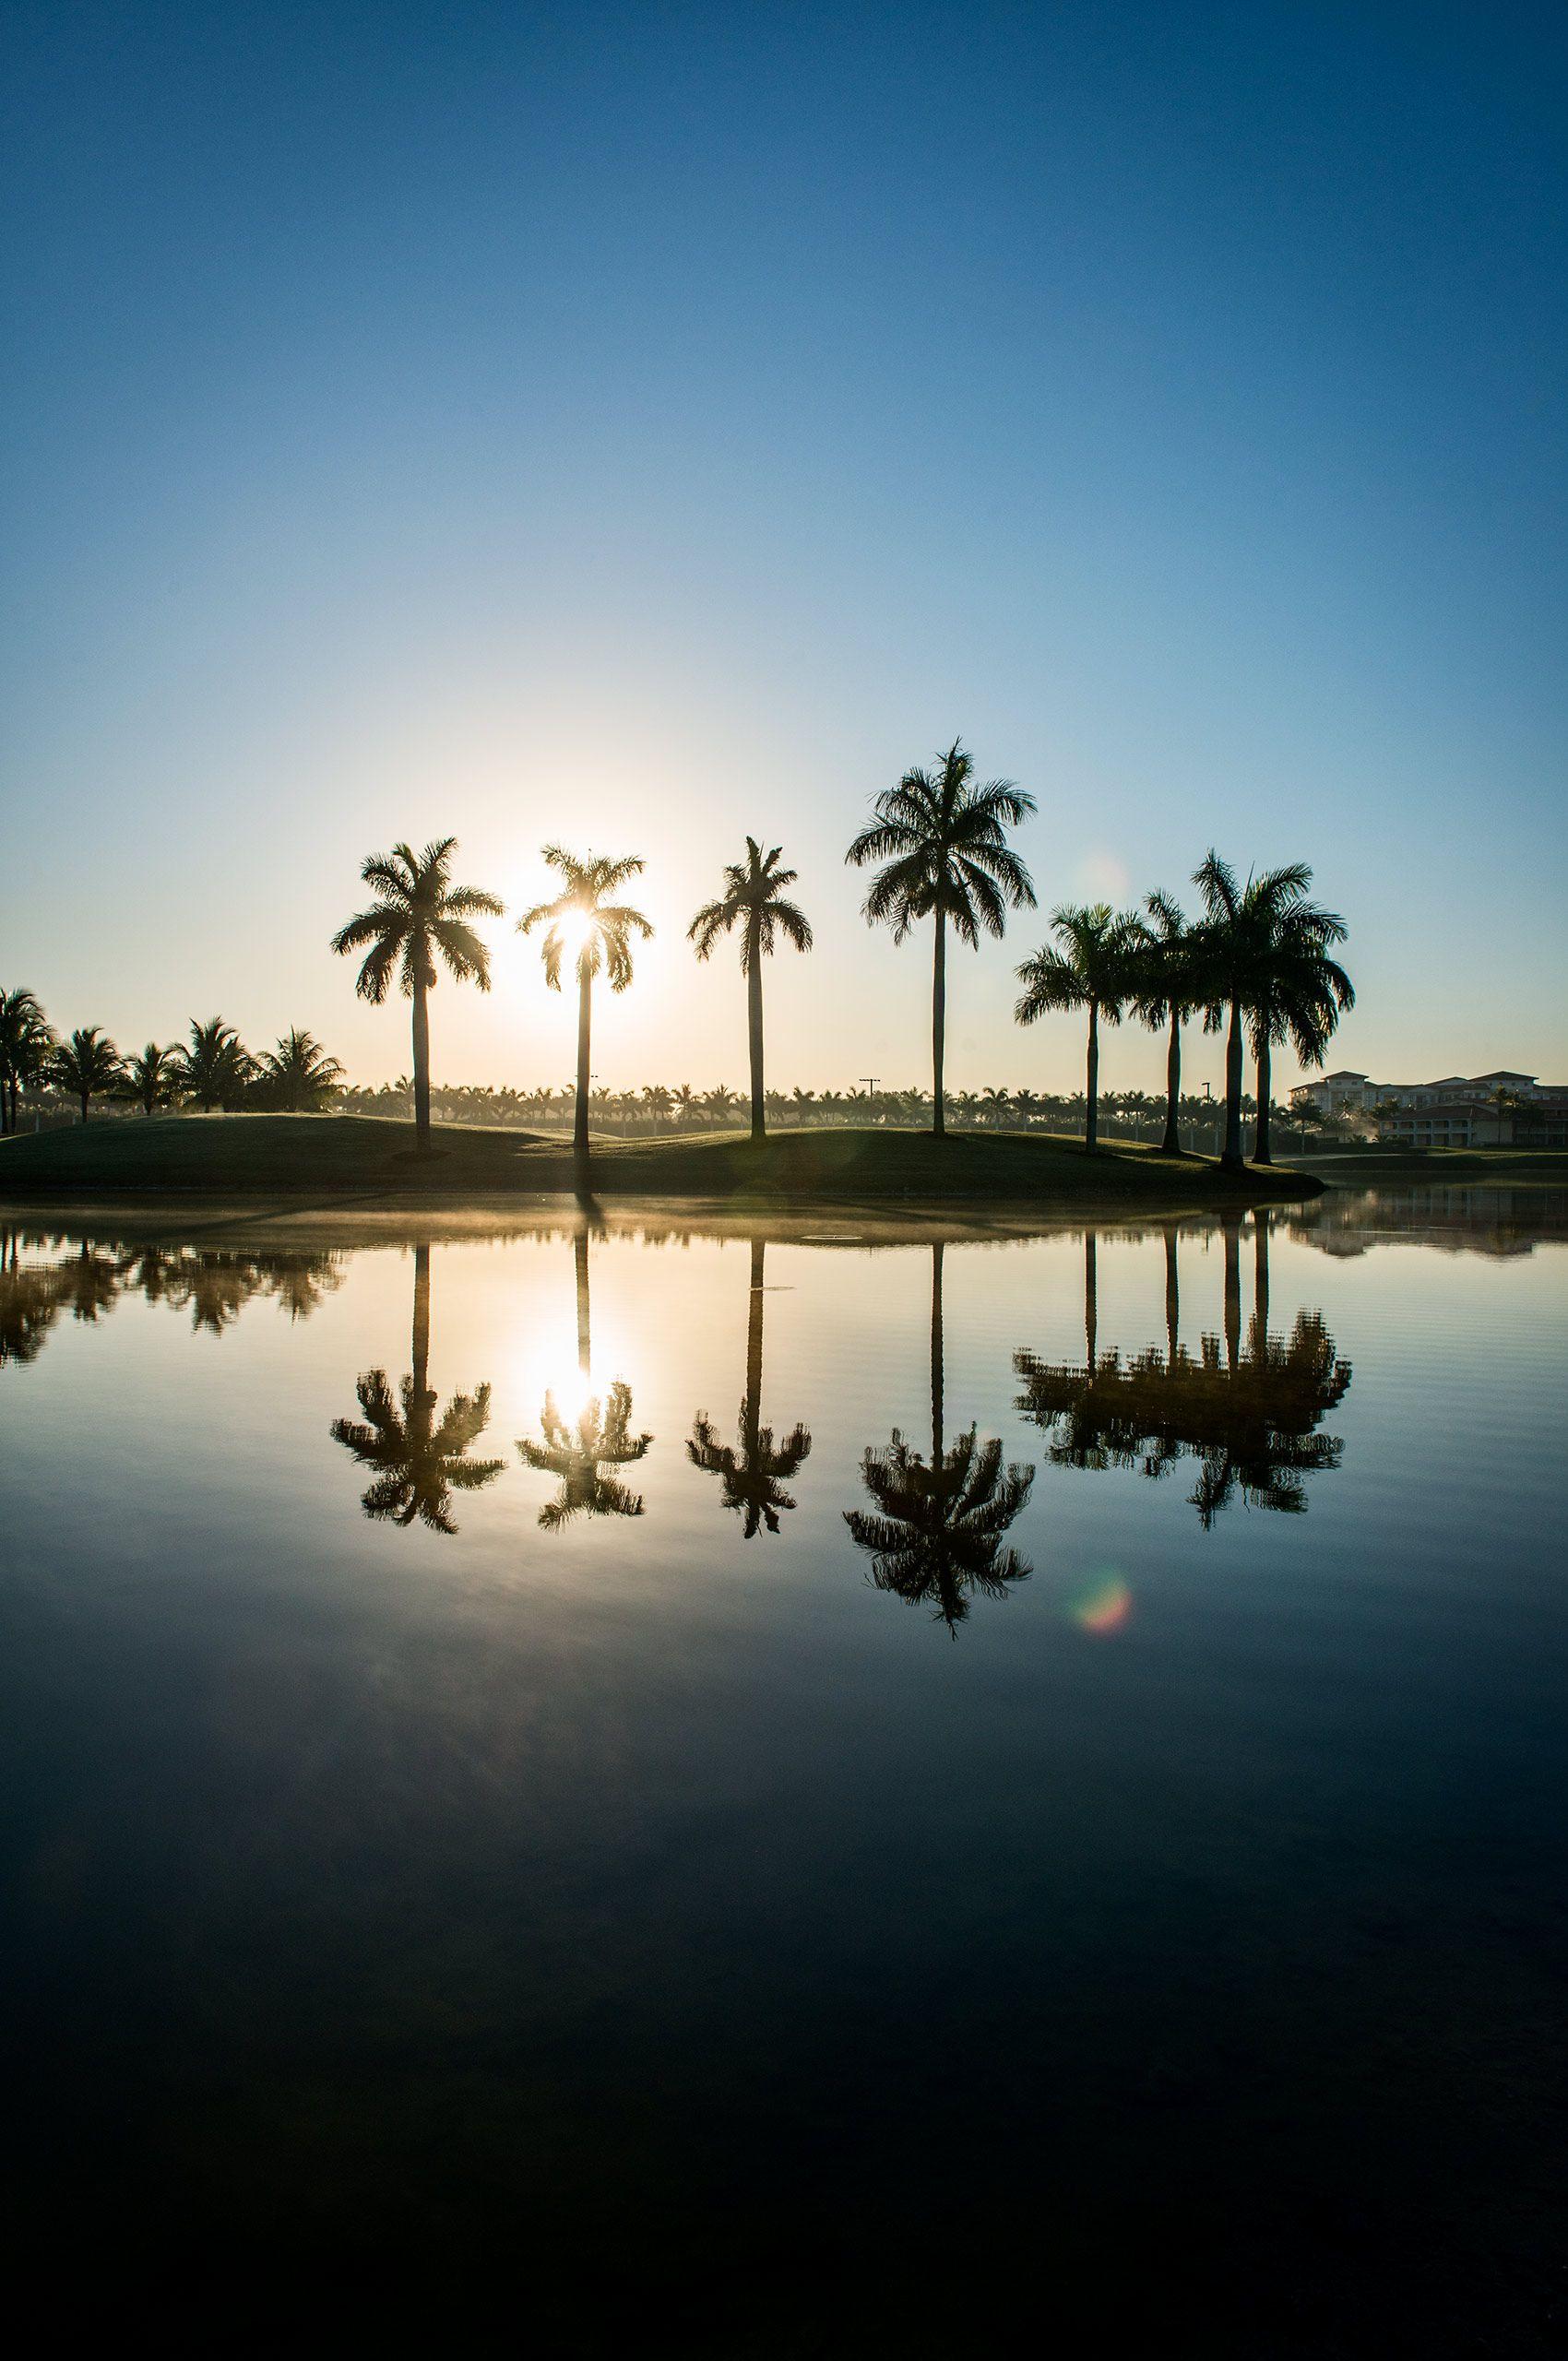 Palmtrees-reflection-in-water-HenrikOlundPhotography..jpg